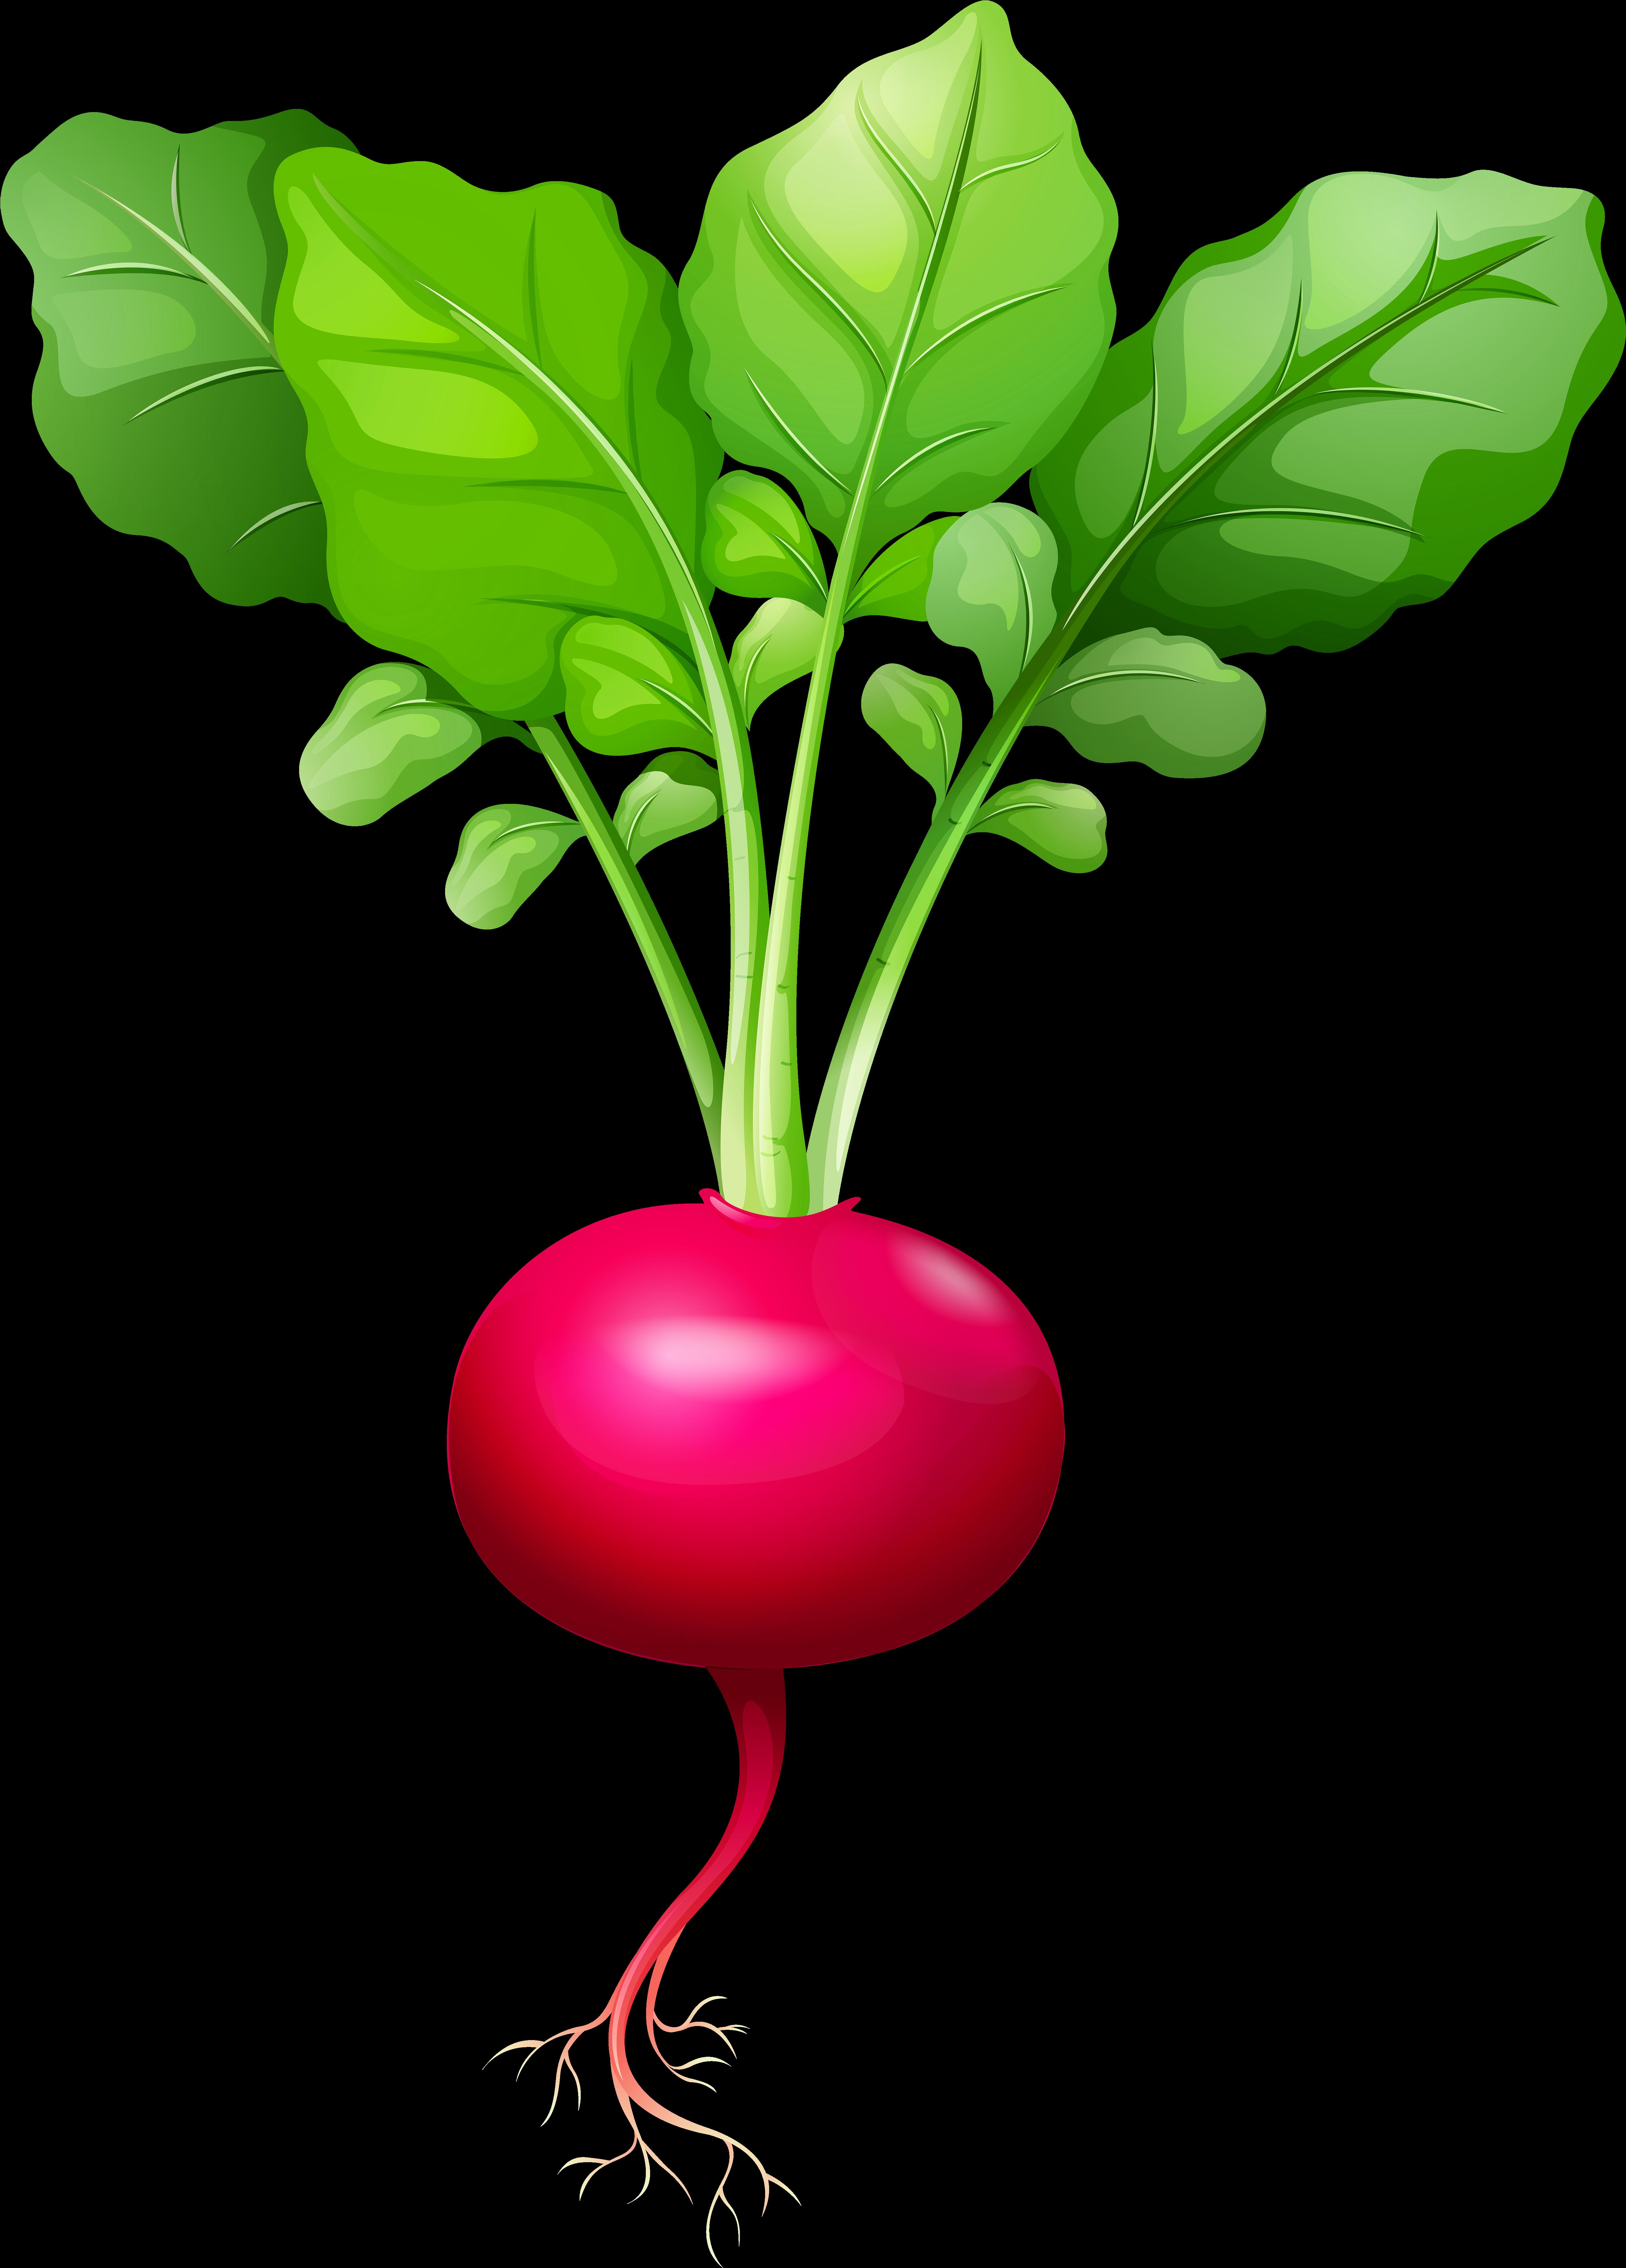 Lettuce clipart flat, Lettuce flat Transparent FREE for download on  WebStockReview 2020